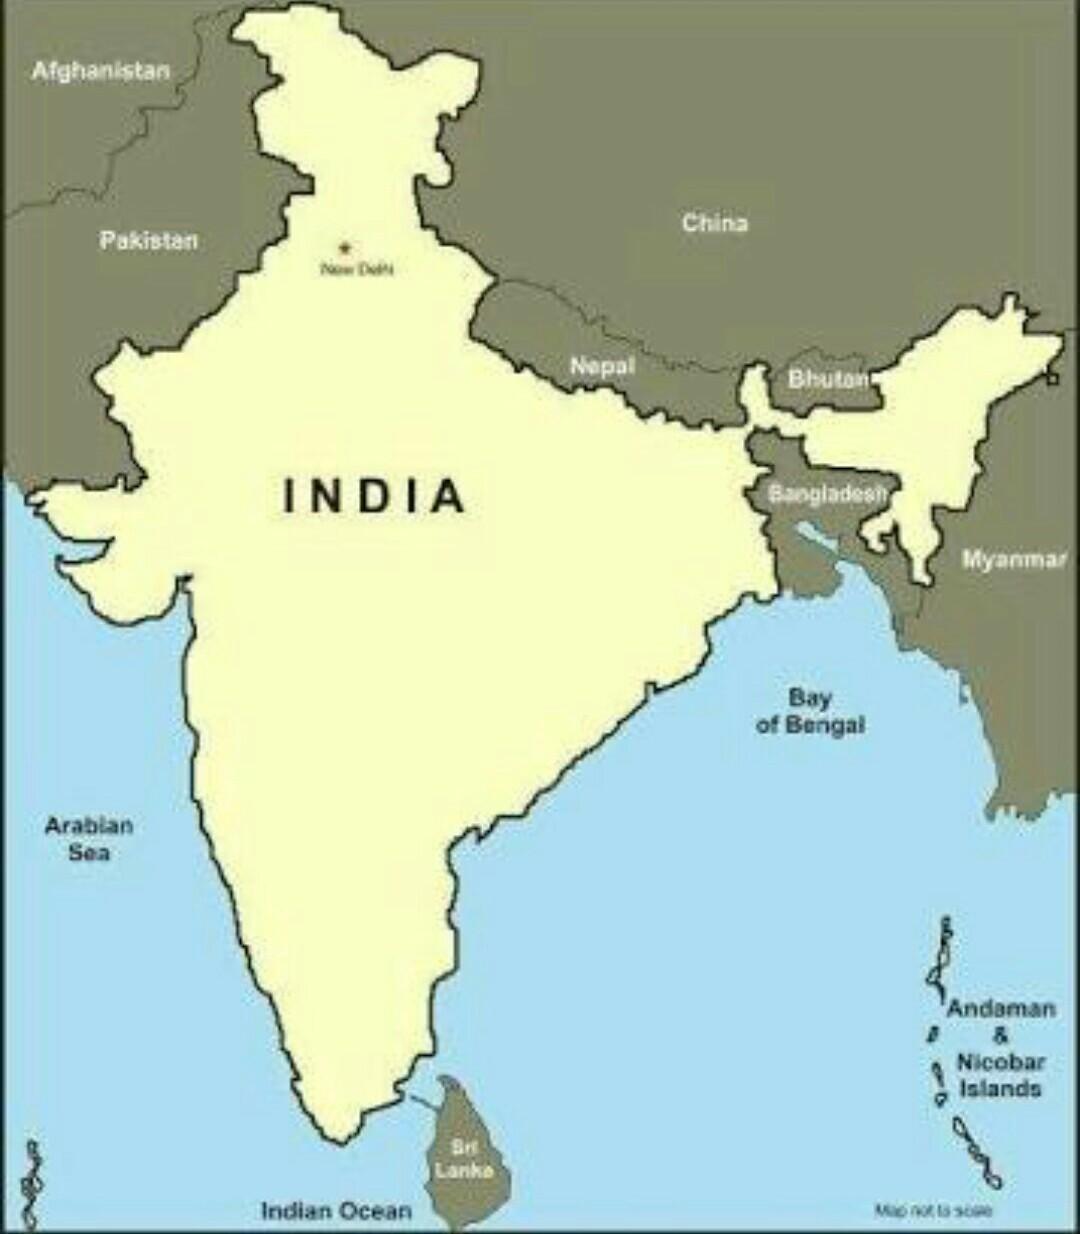 Draw A Map Pointing Places Like Nepal Pakistan Bangladesh England